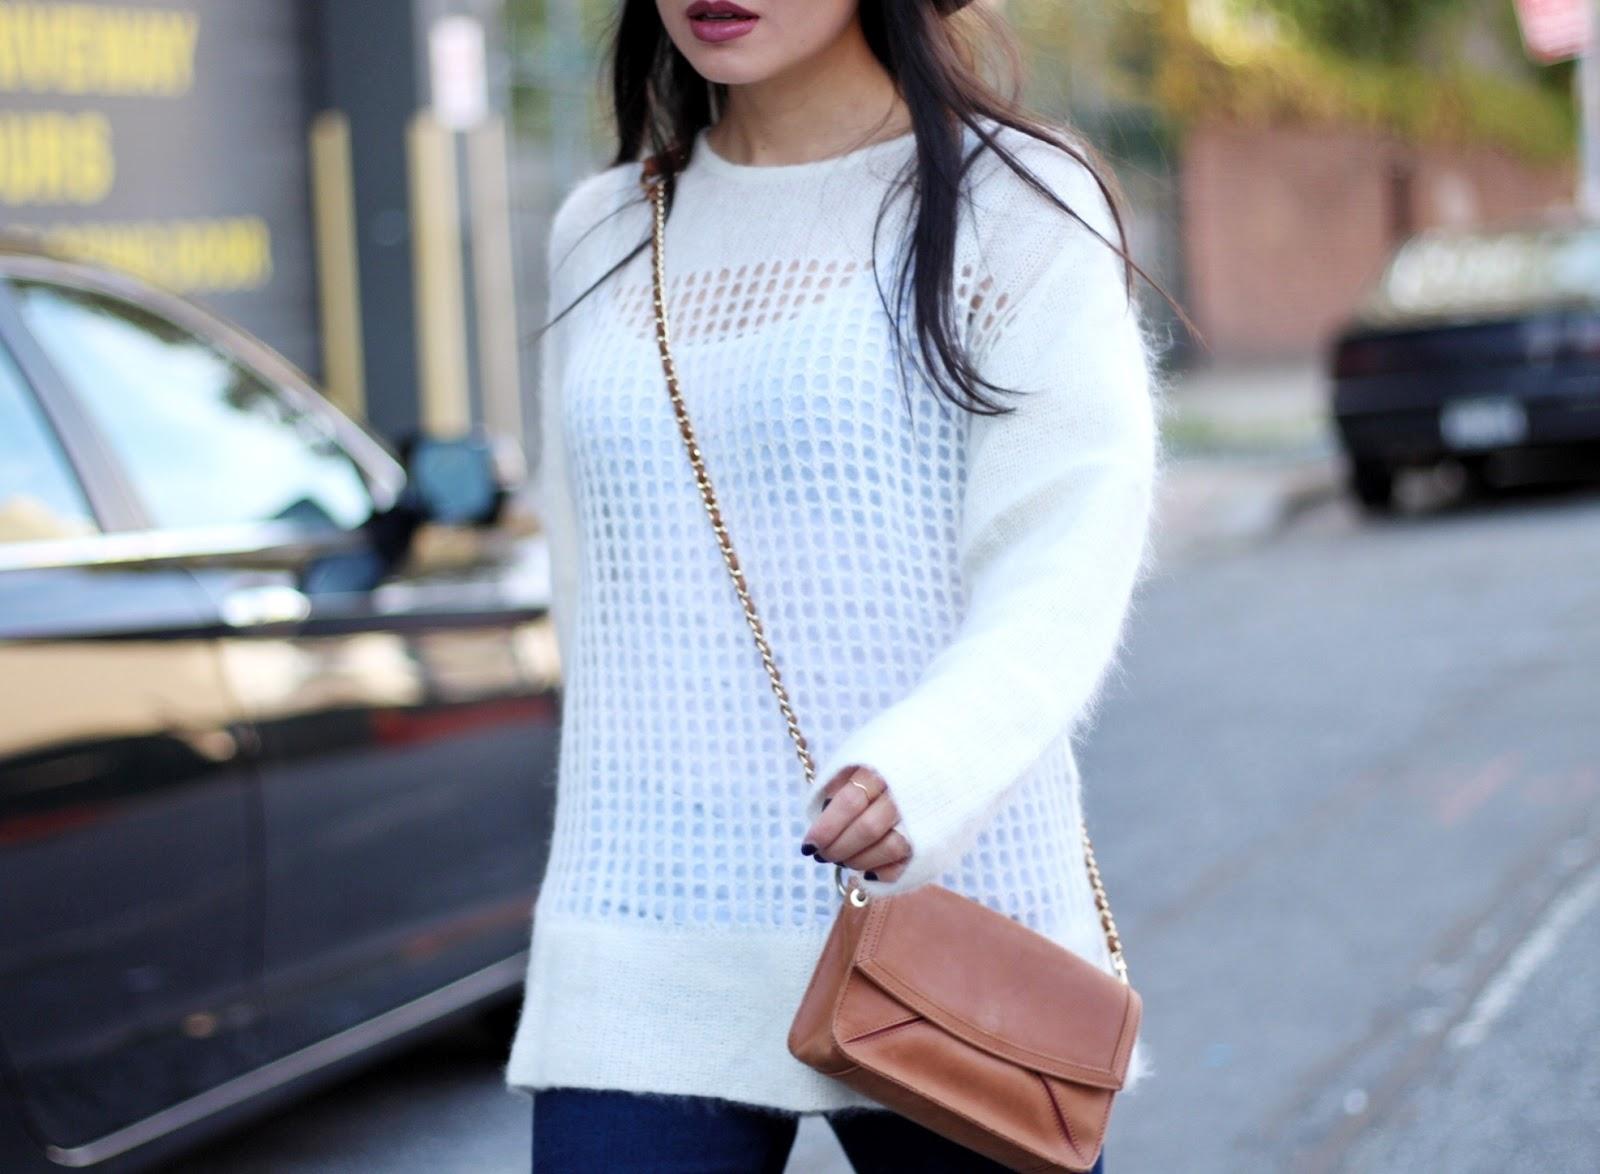 Helmut Lang knit sweater L'agence elysee flares Rag & Bone fedora